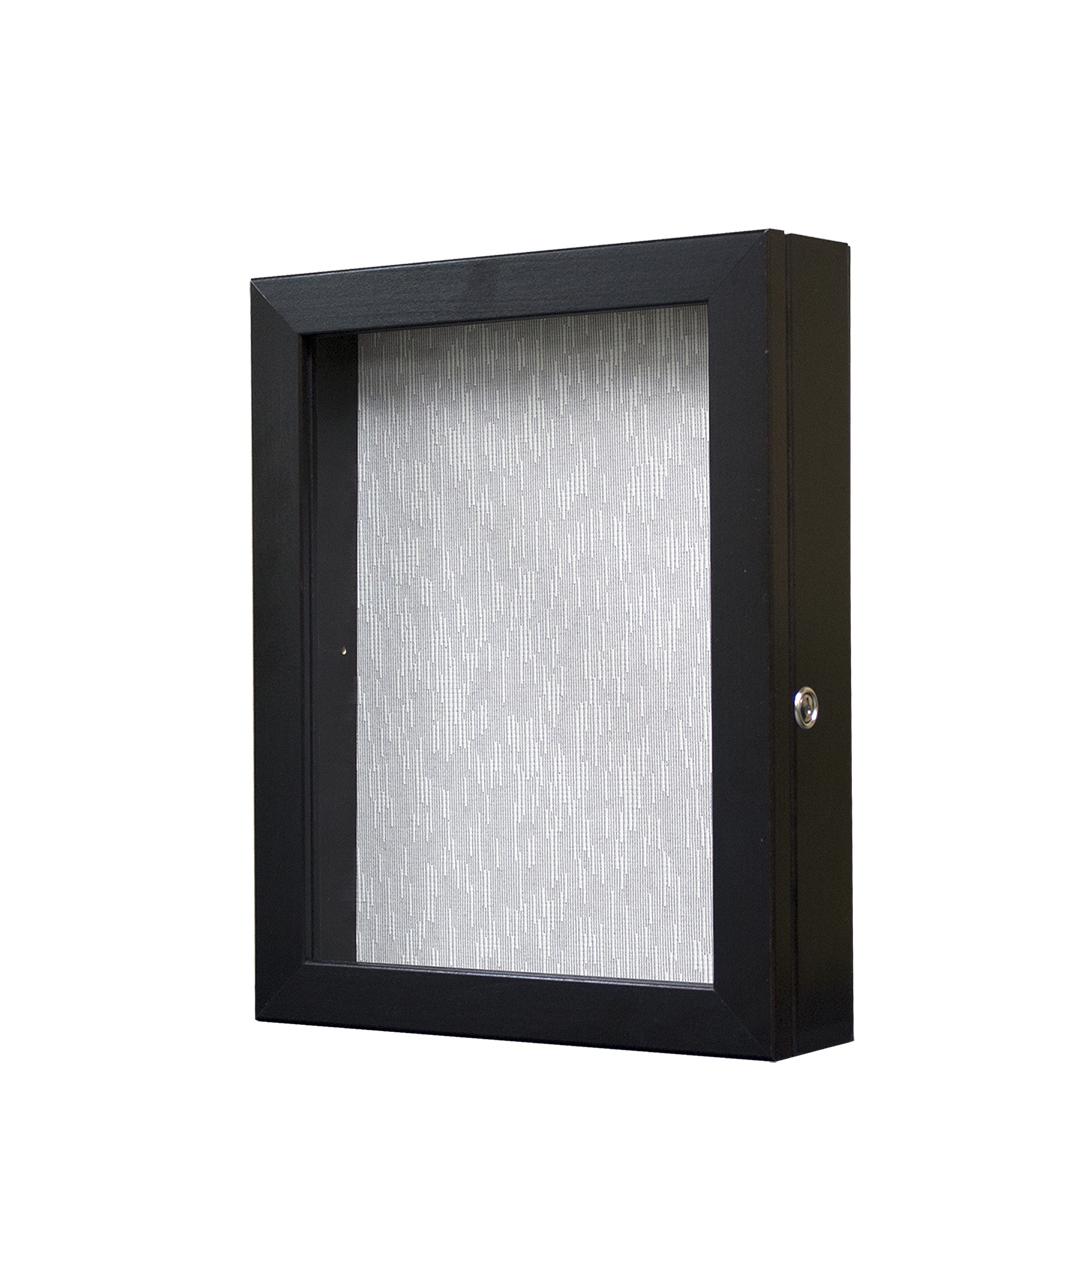 Cabinet-02.jpg